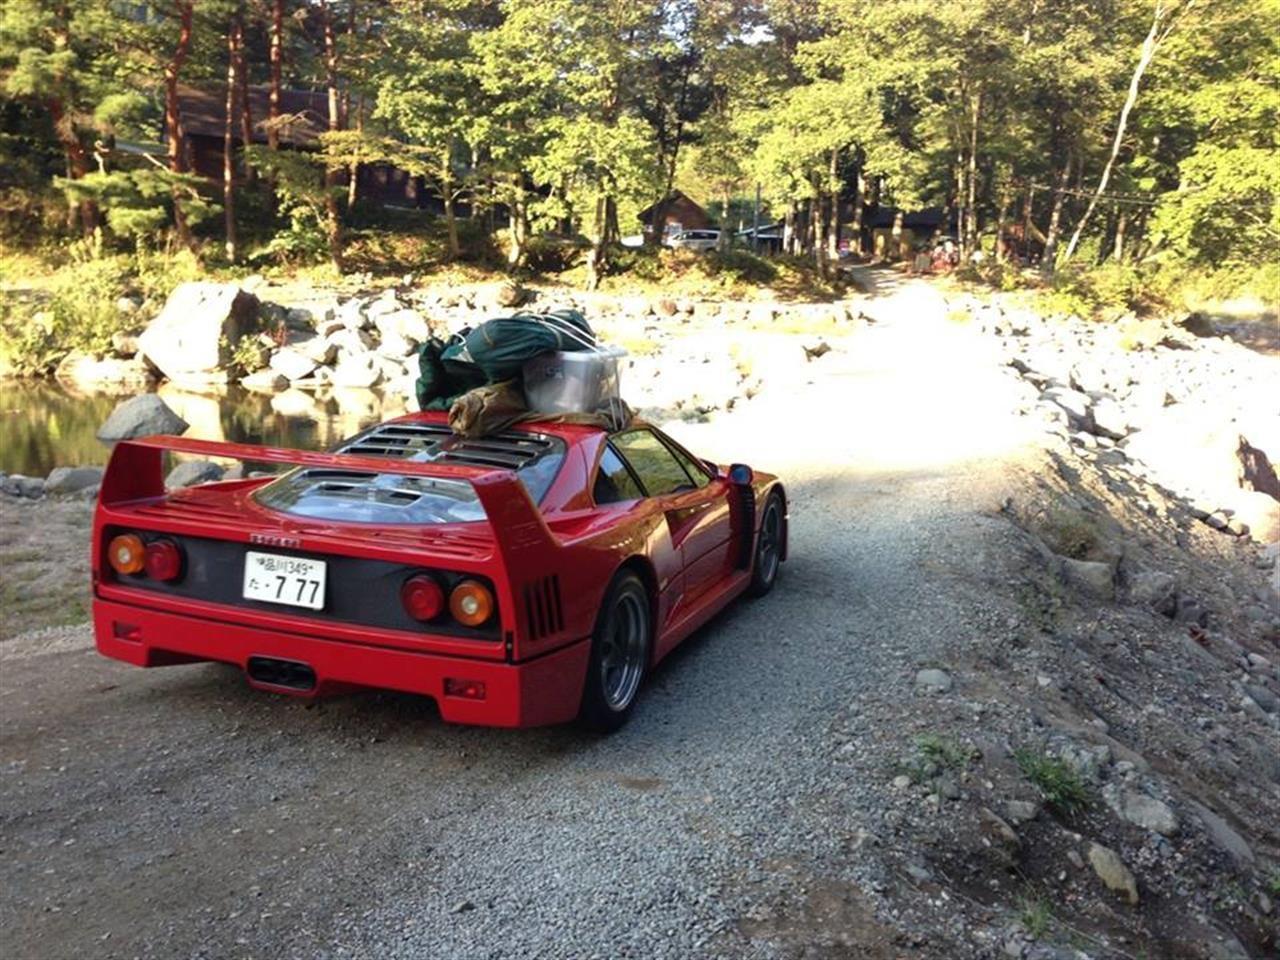 Ferrari-F40-camping-trip-001.jpg